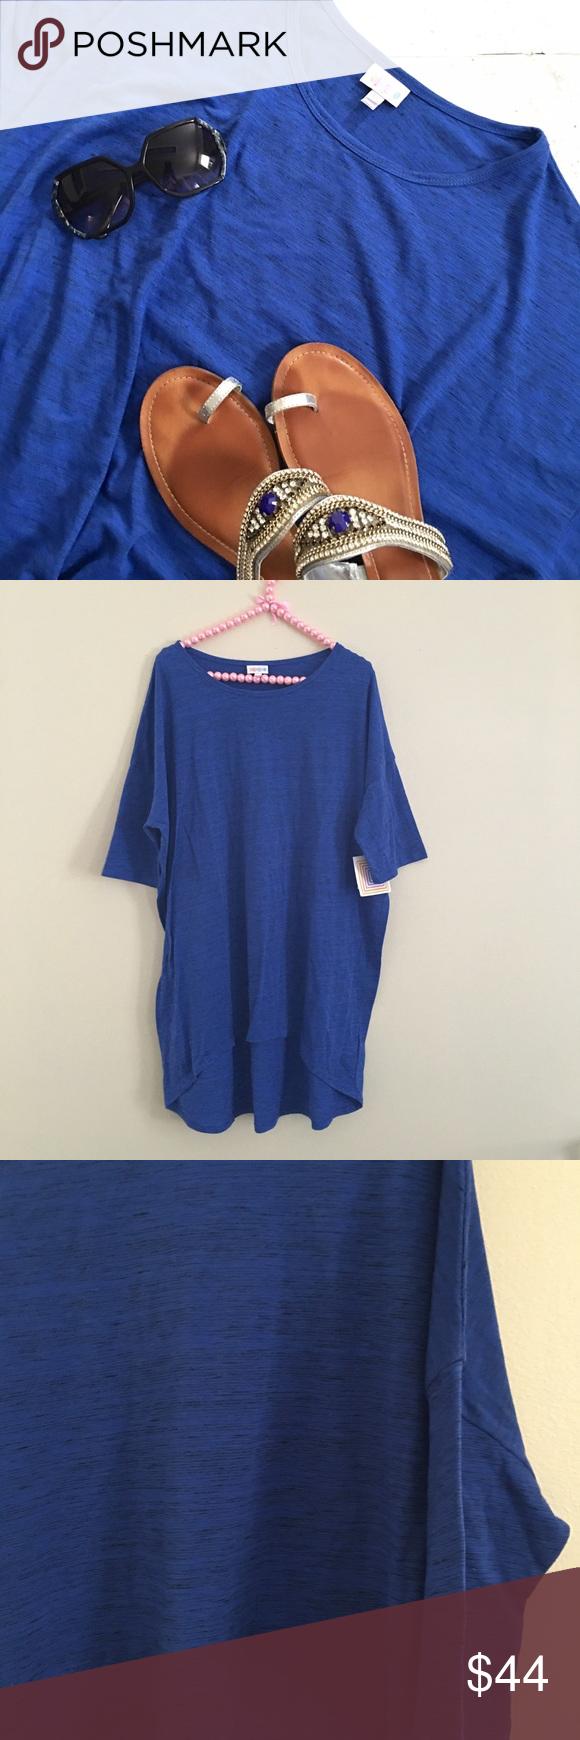 da794ed0710 Lularoe Irma Shirt Price